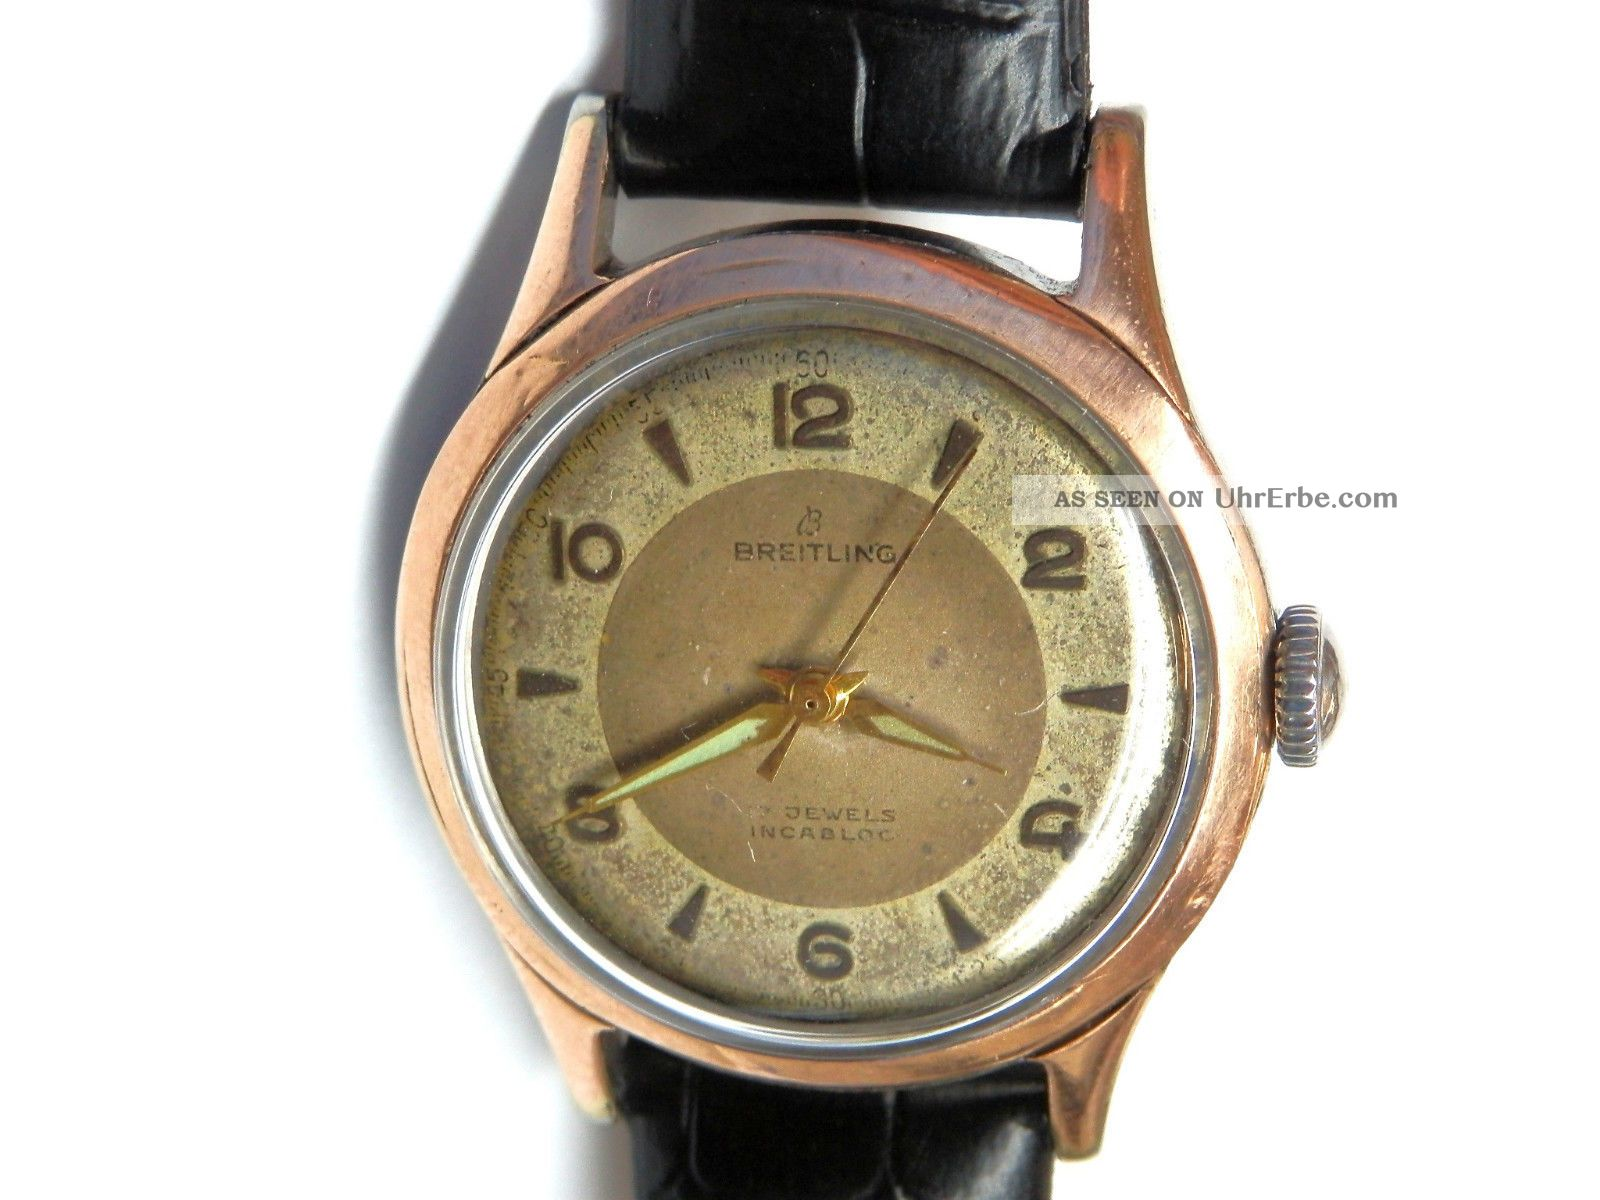 Vintage Breitling Genève Chronometr Zwei Töne.  Armbanduhr.  As 1187 Armbanduhren Bild